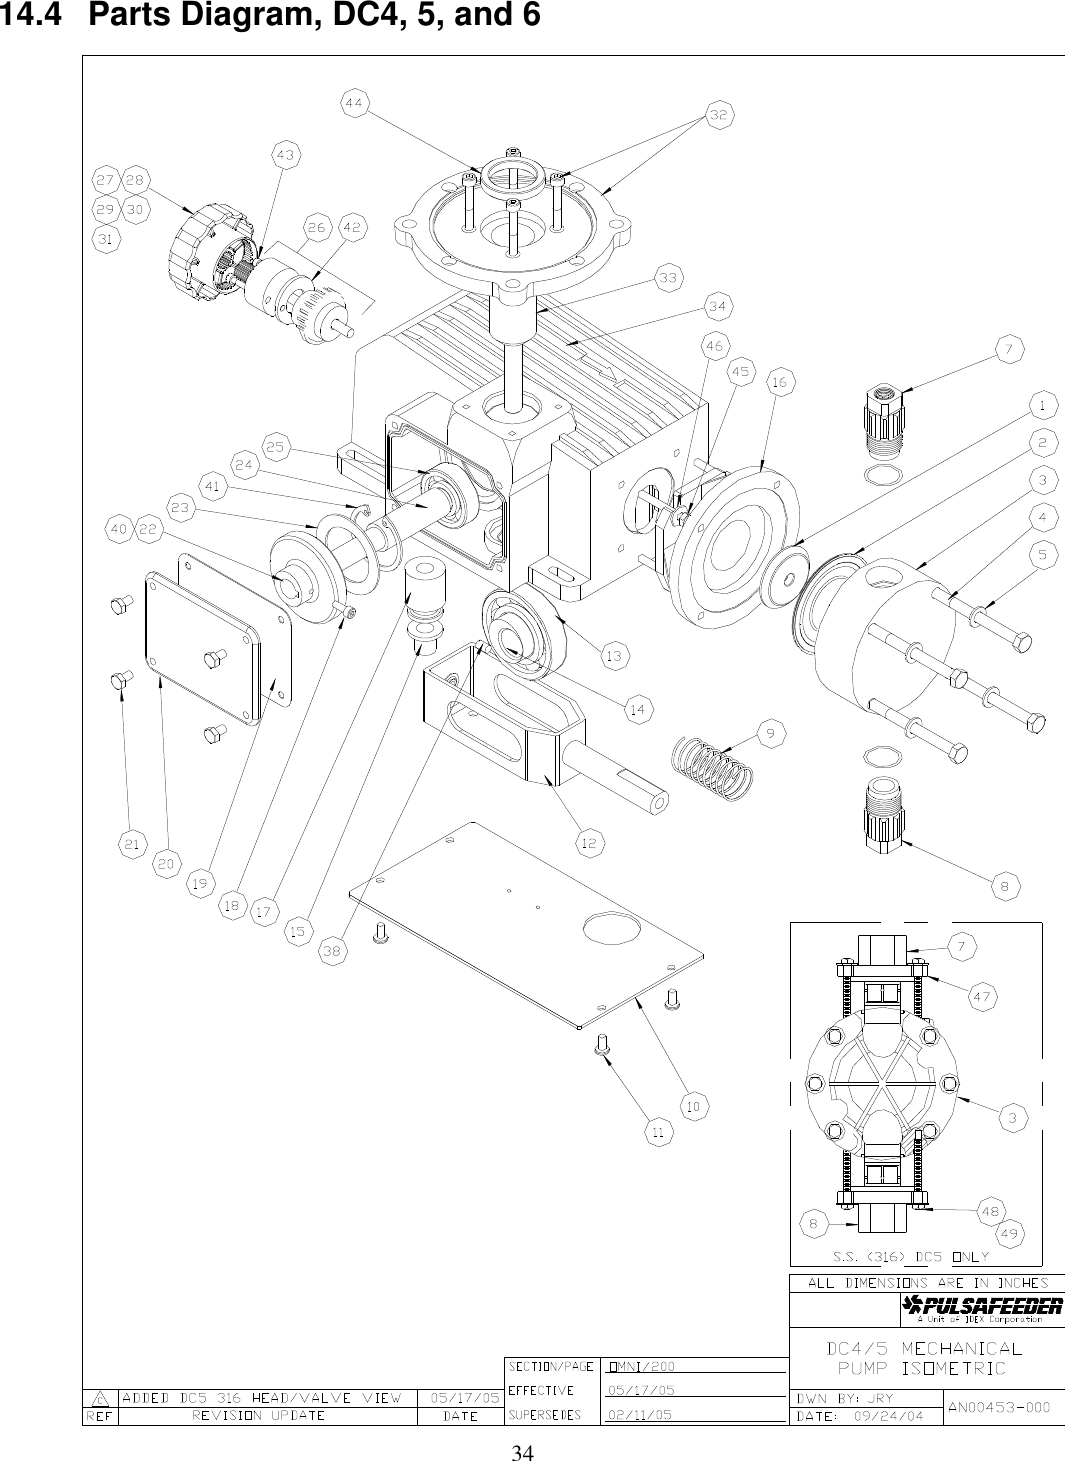 Honeywell Water Pump Dc2 Users Manual OMNI IOM Rv E